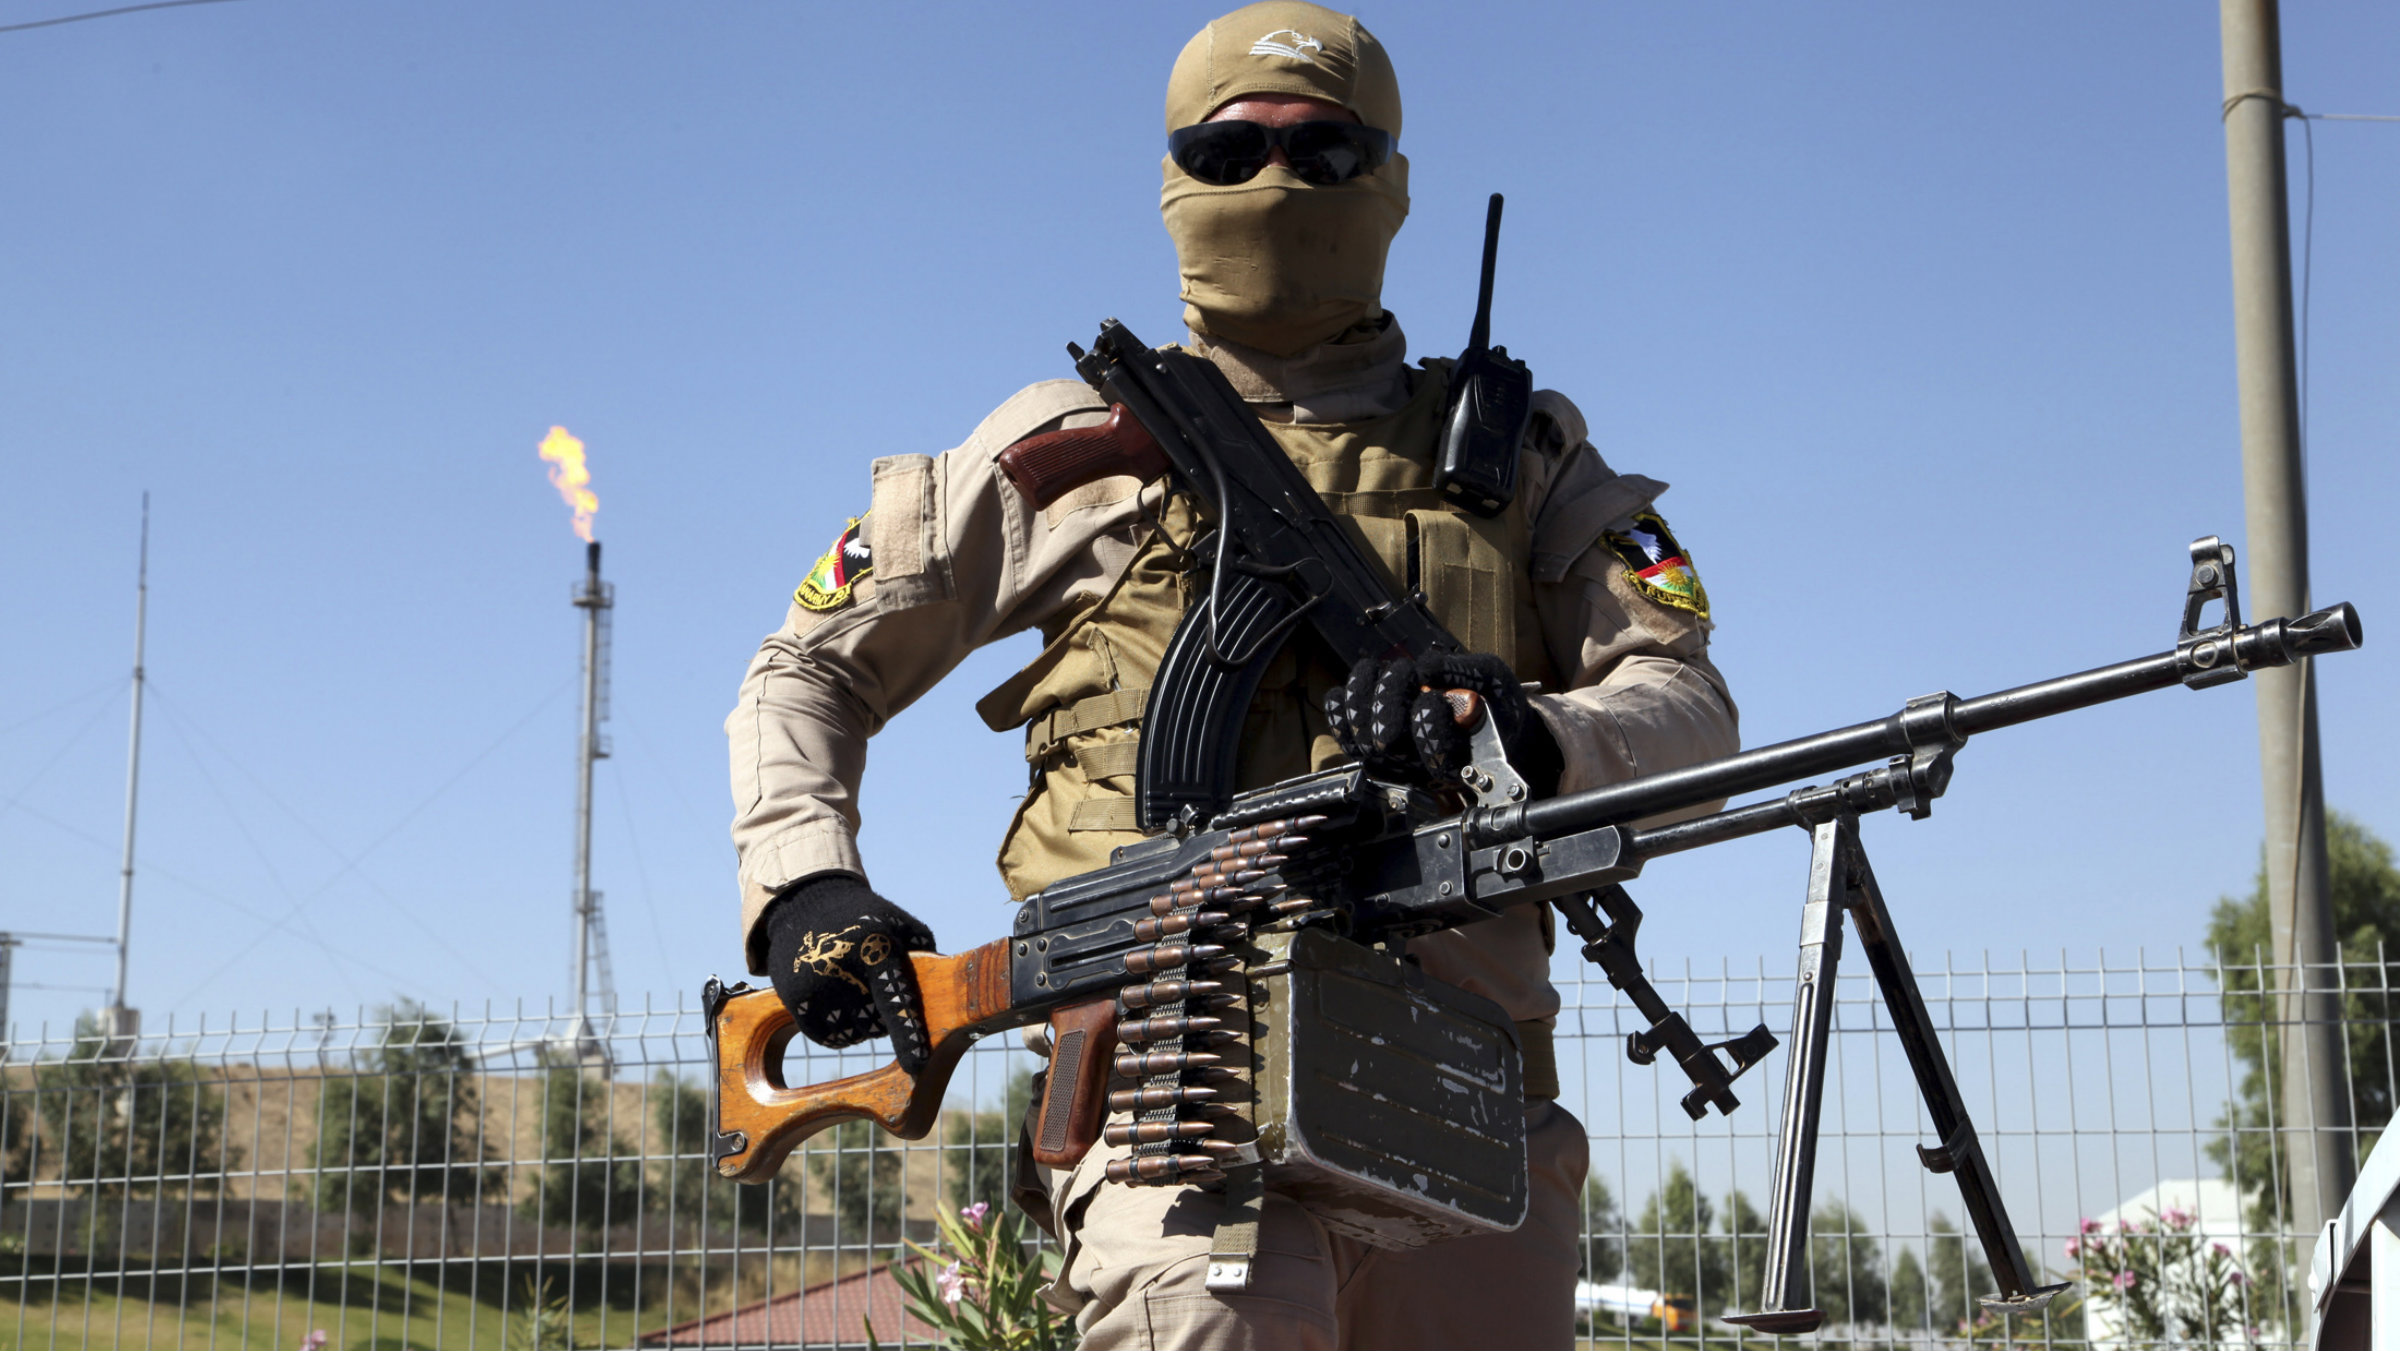 Kurdish peshmerga fighter guarding a refinery outside of Mosul on June 24, 2014.